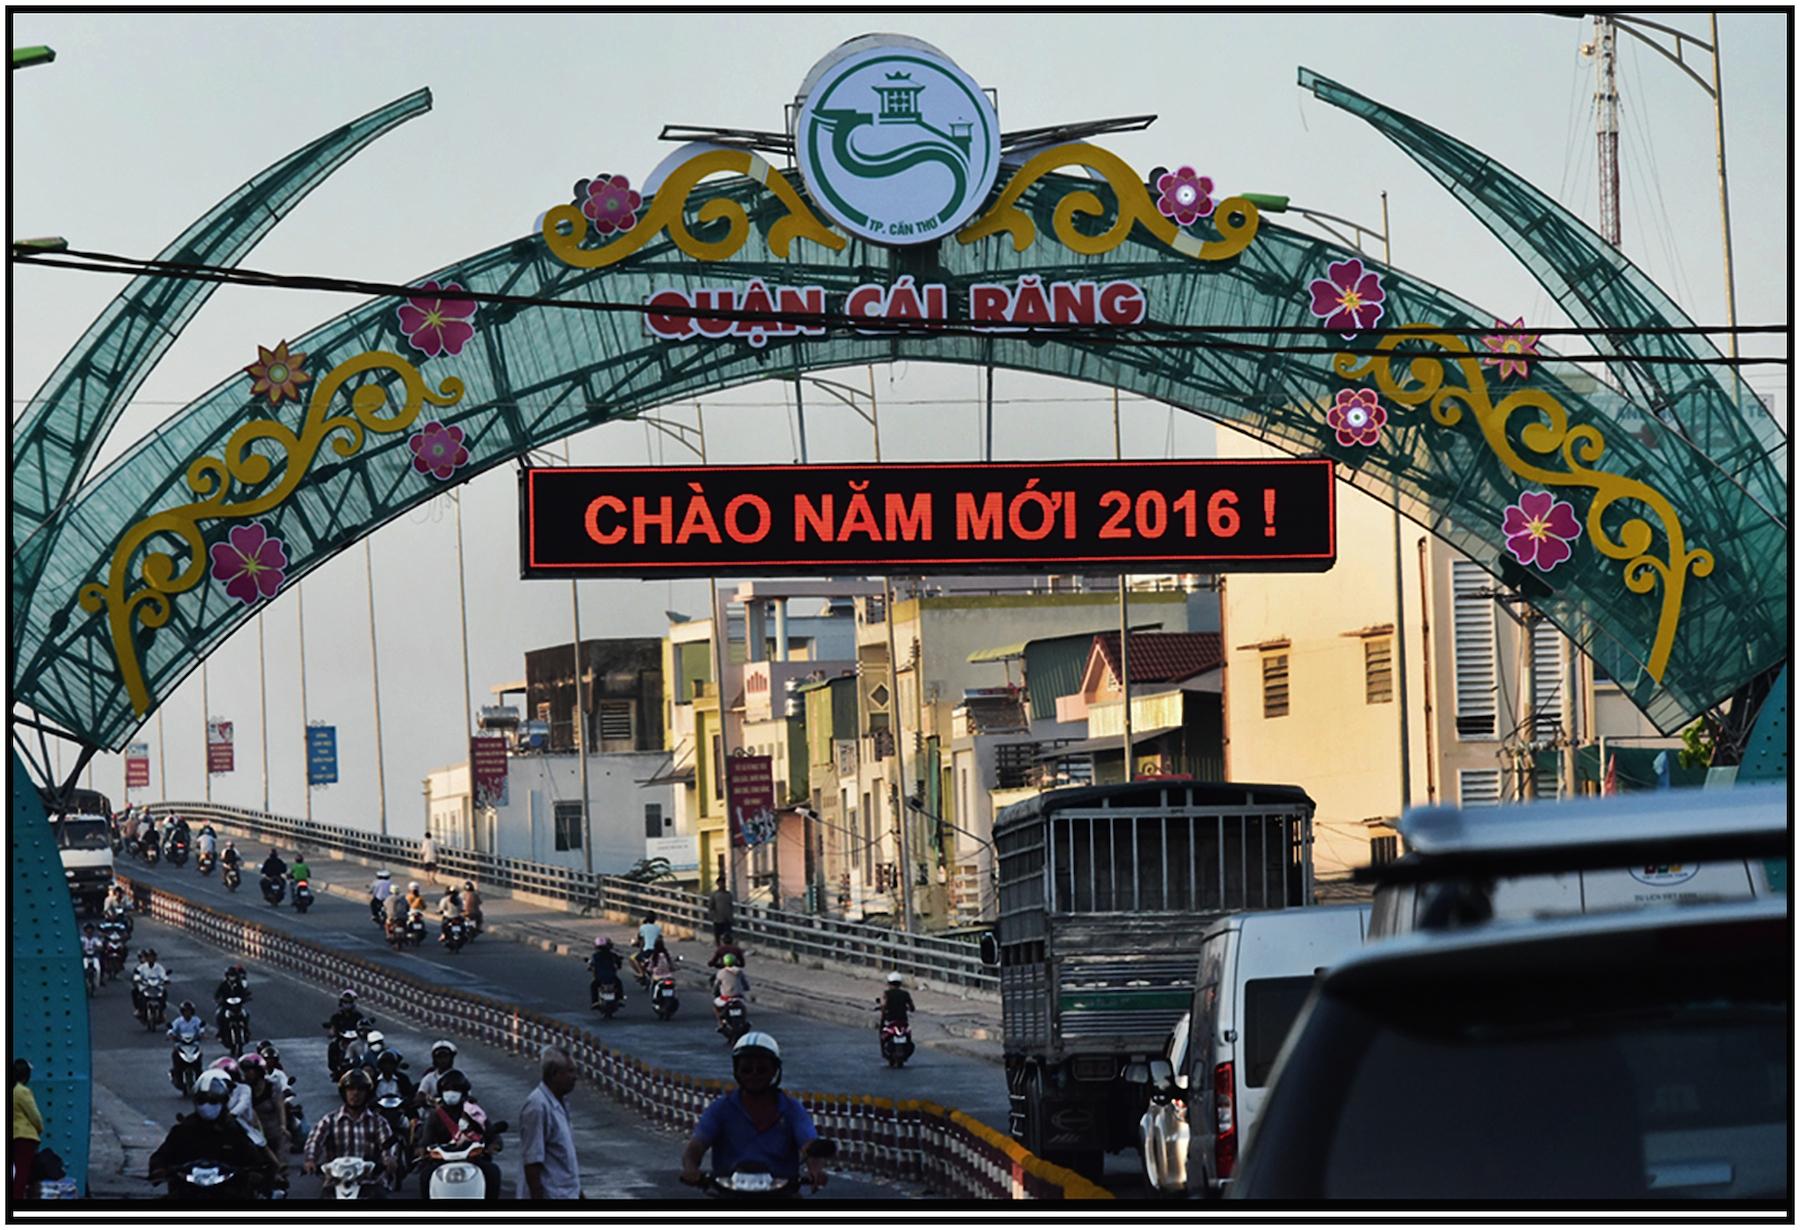 Can Tho, Mekong Delta, Jan. 2016. #8884